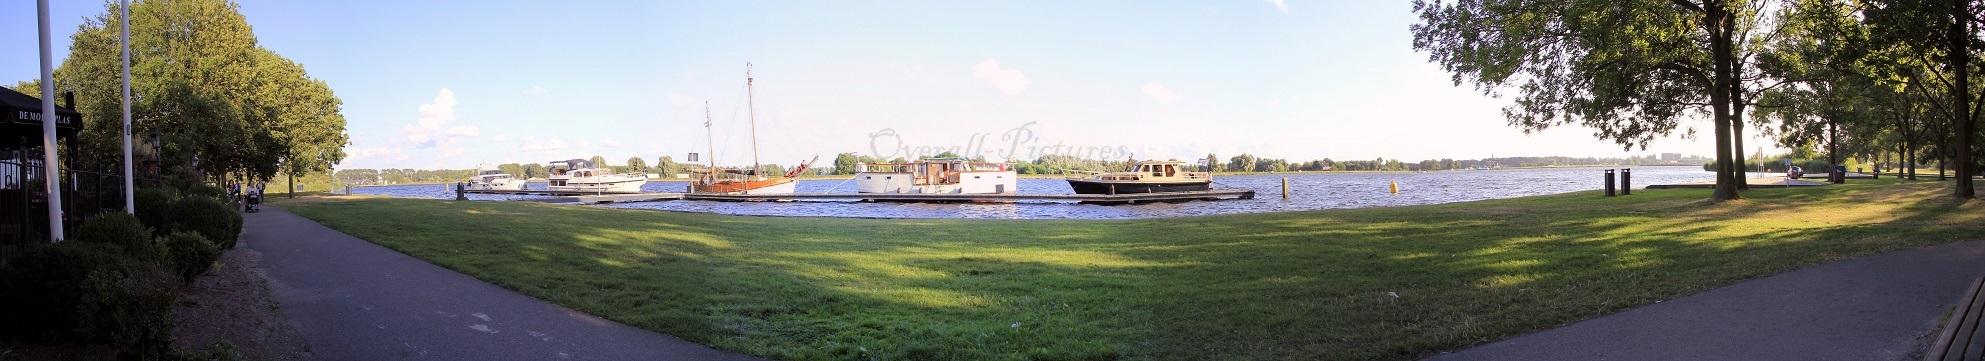 Molenplas Haarlem Panorama